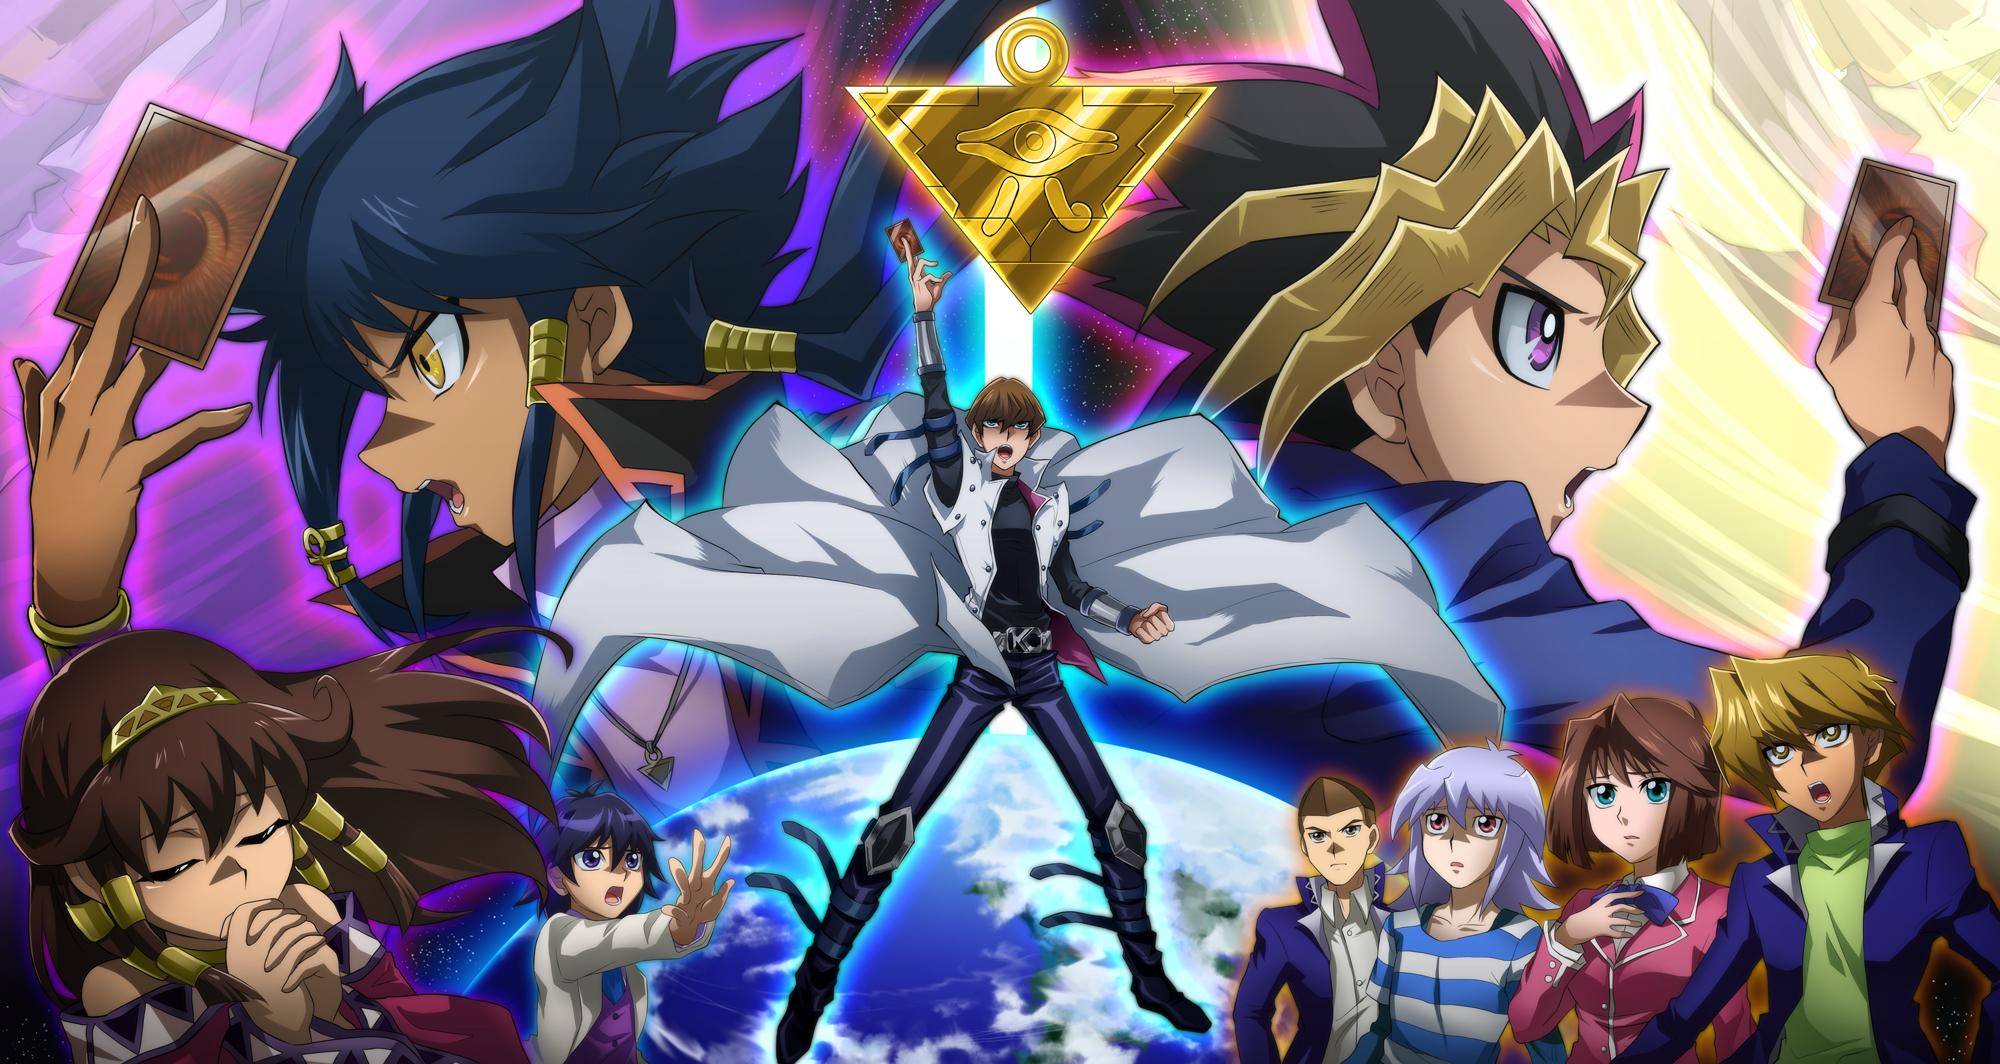 Yu-Gi-Oh!: The Dark Side Of Dimensions